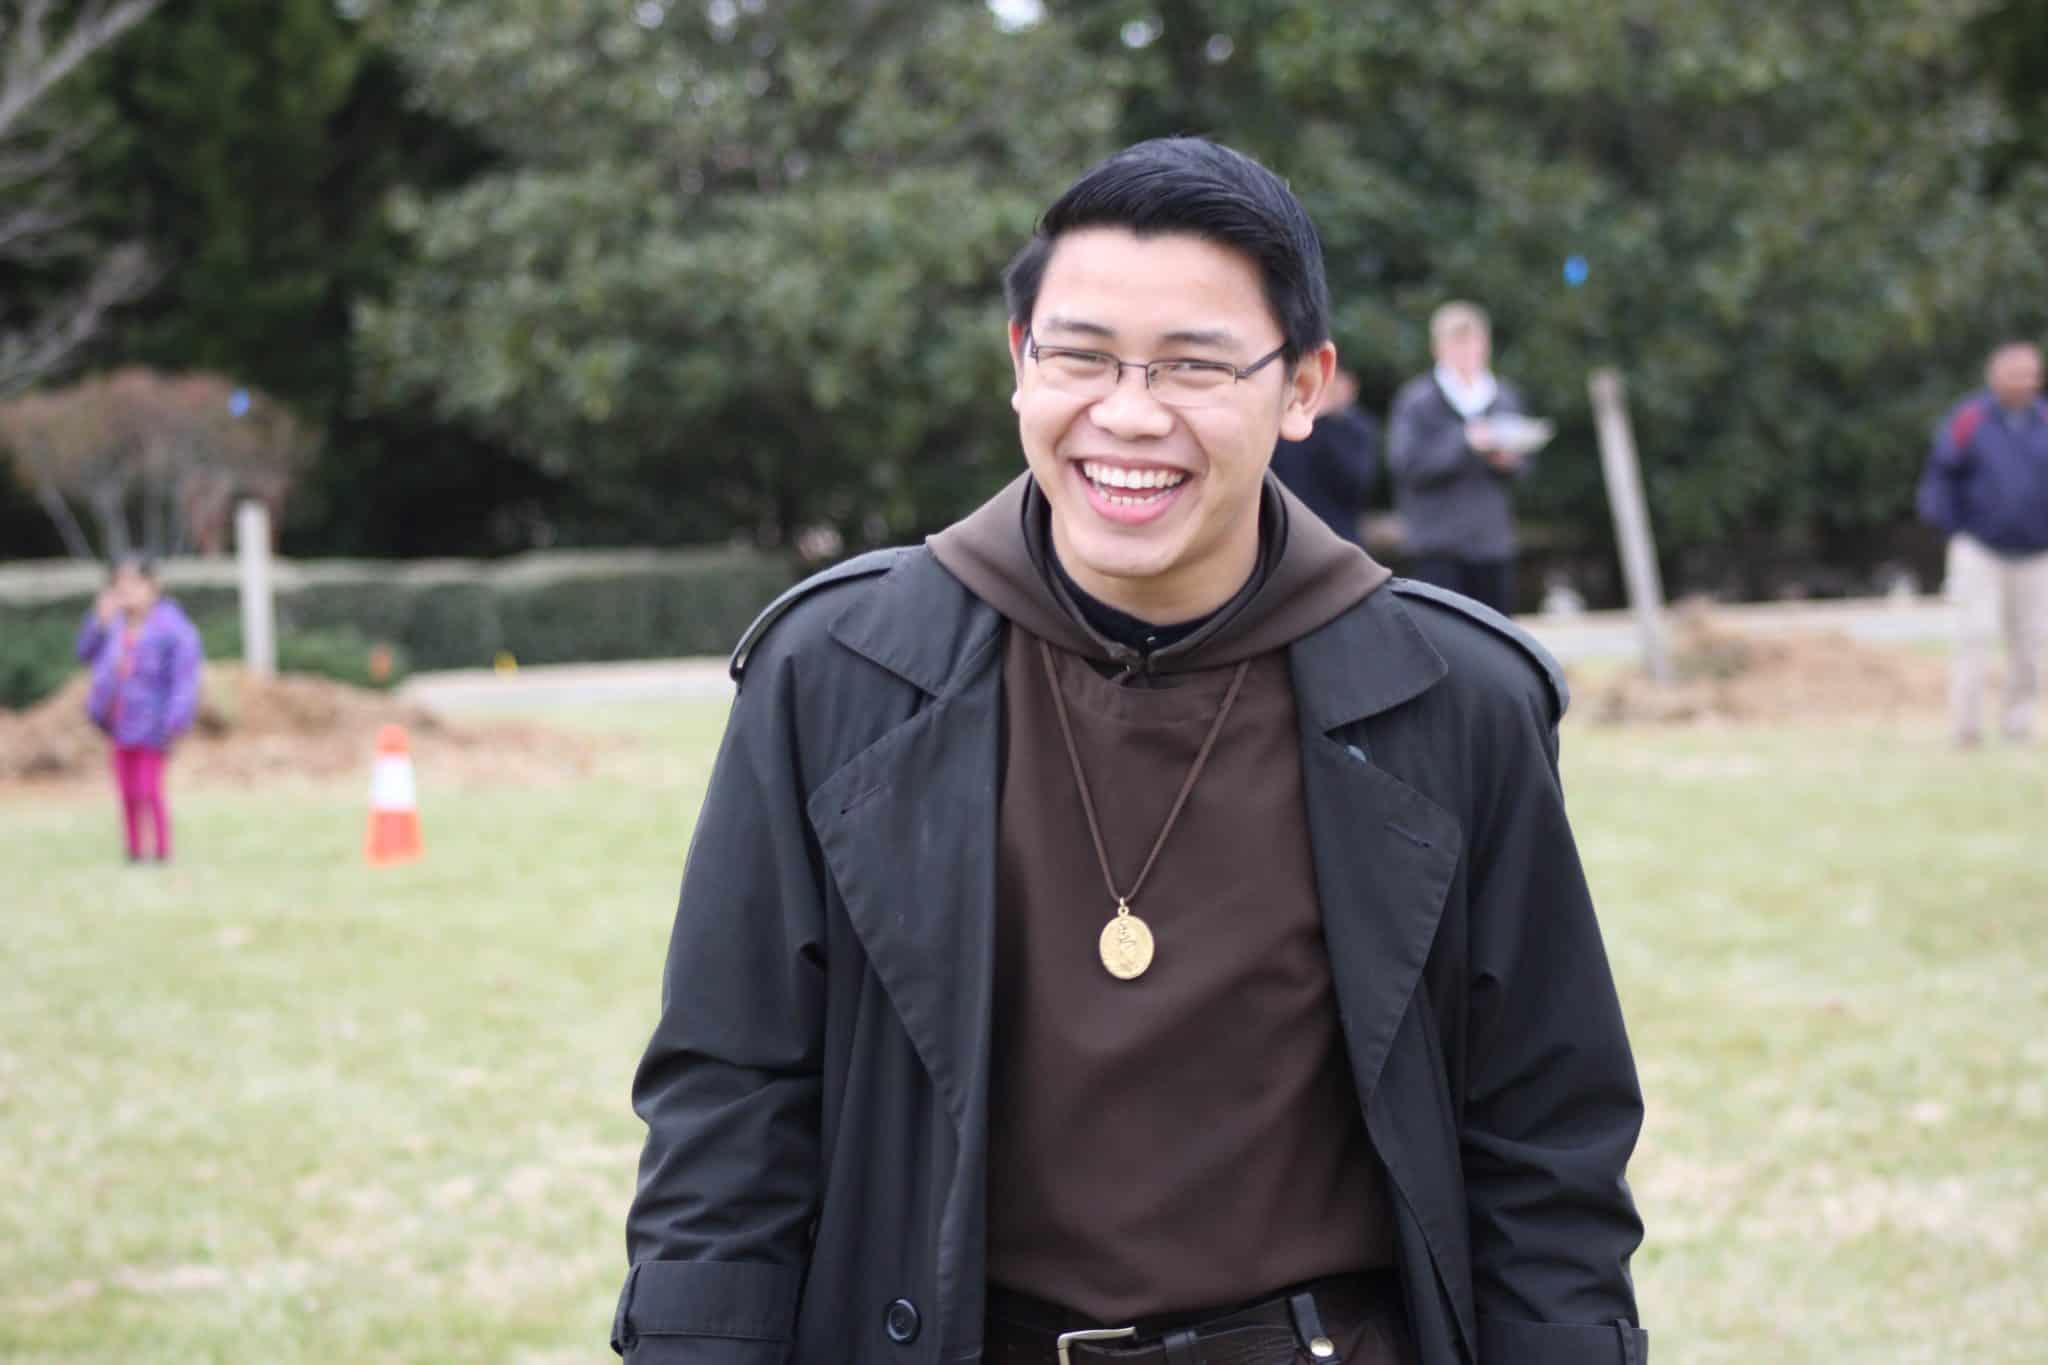 Br. John grinning